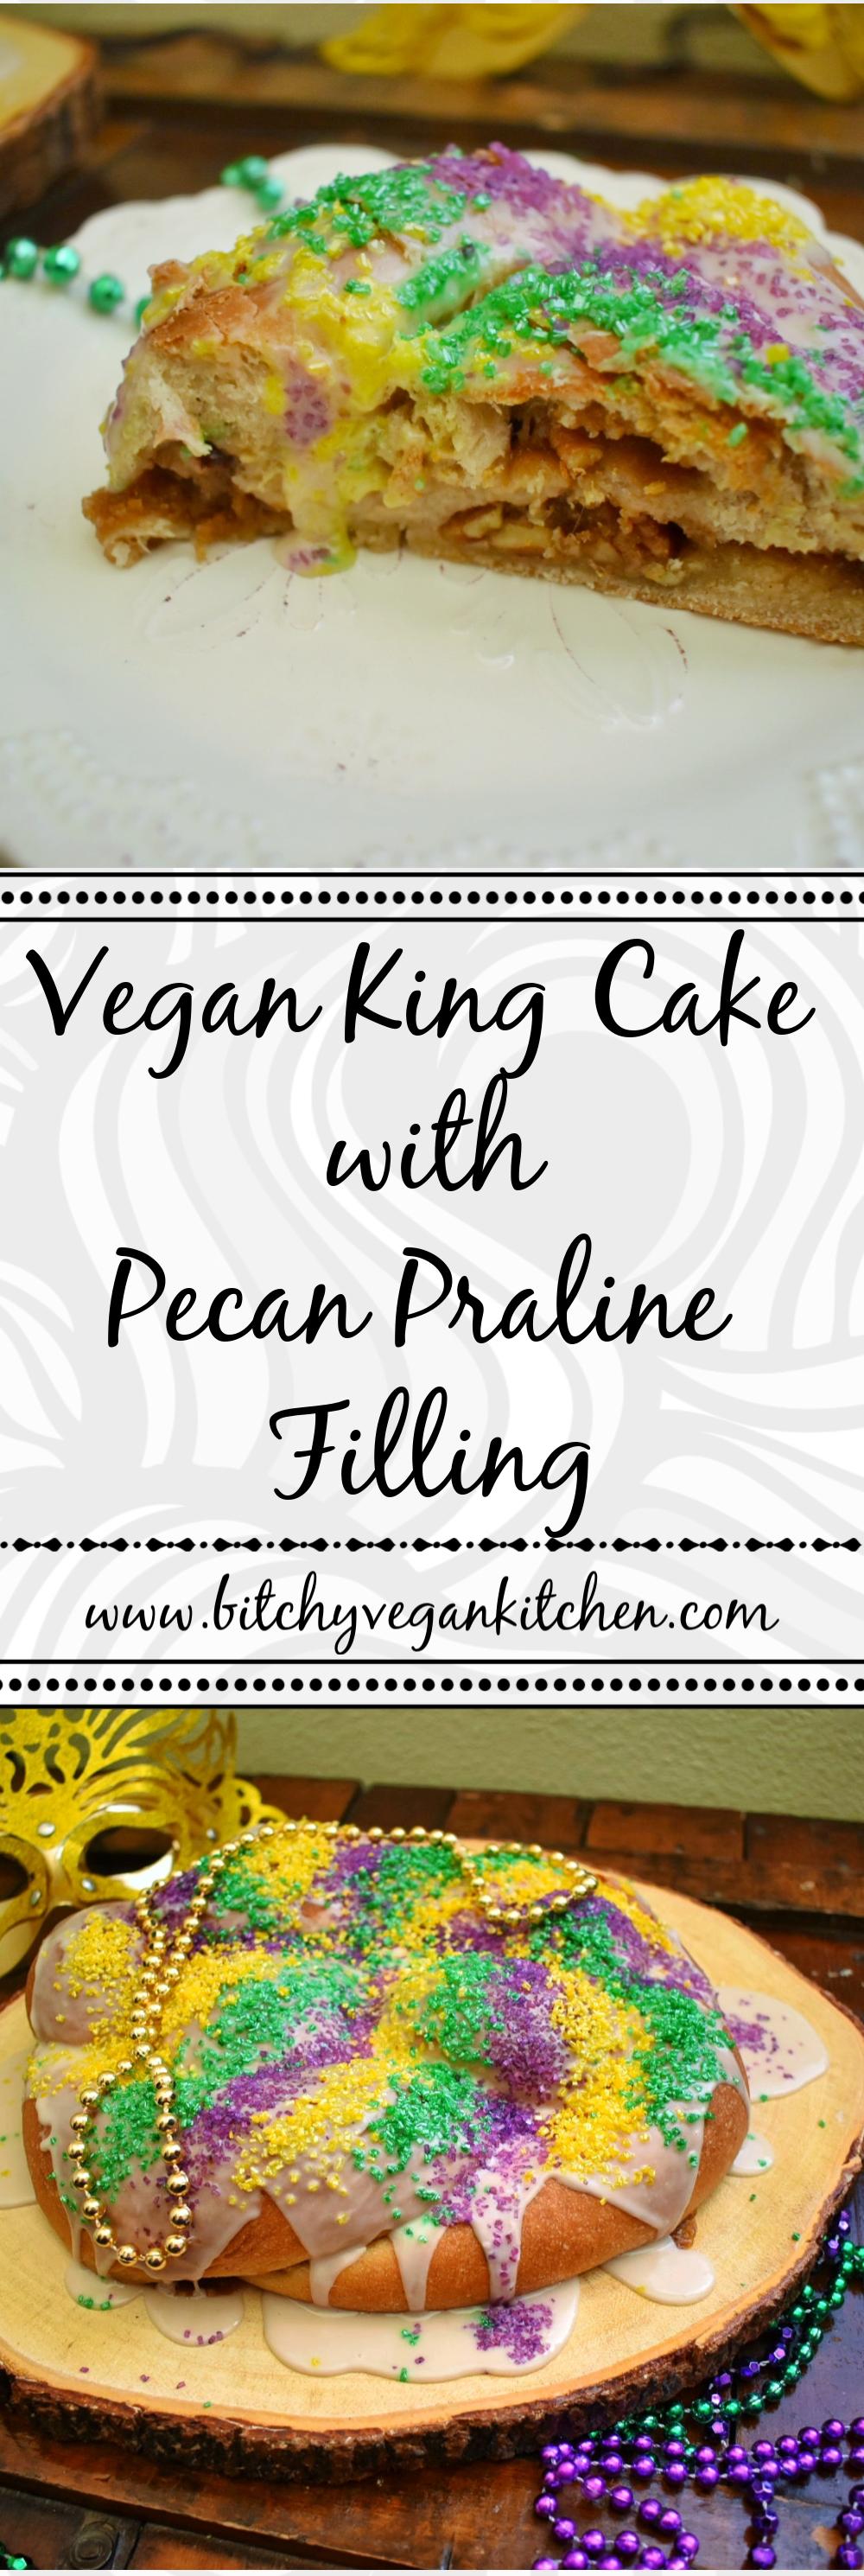 Vegan King Cake - The Bitchy Baker